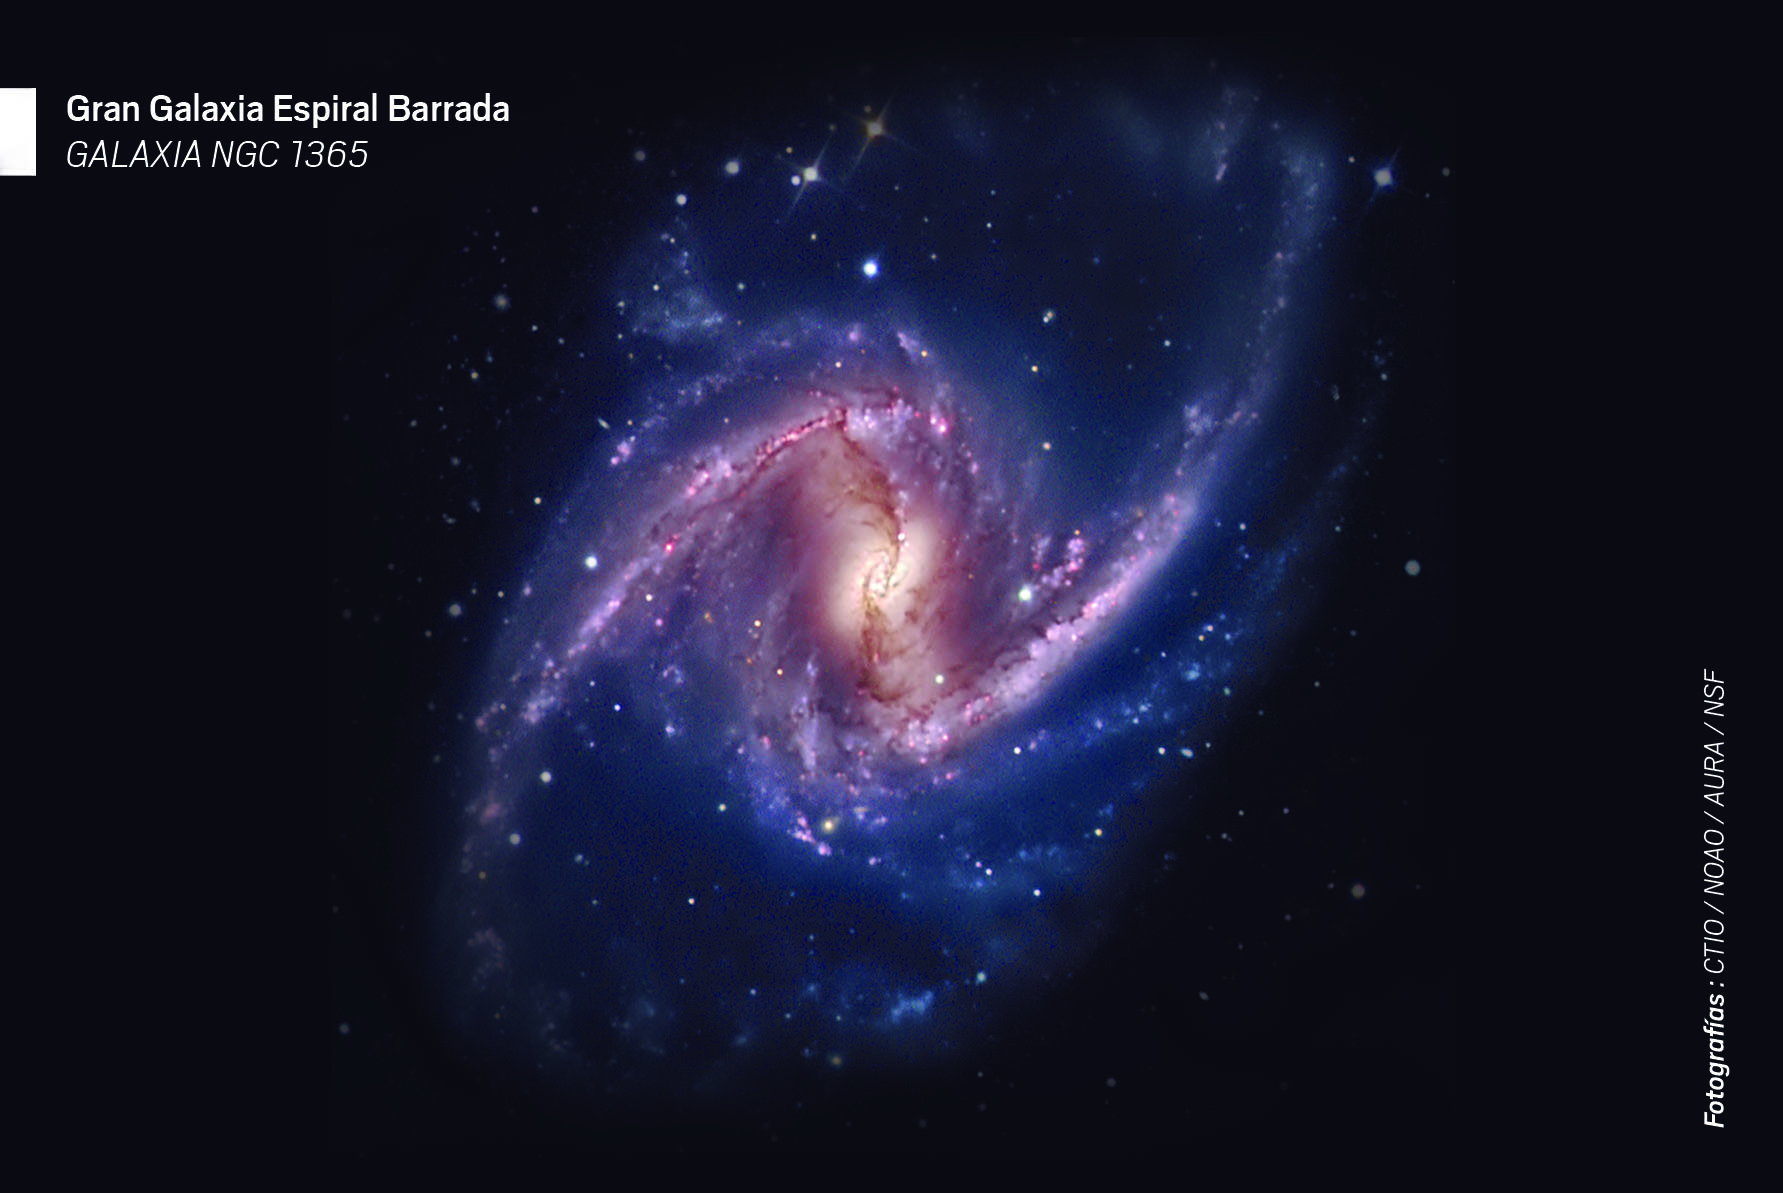 http://www.difuciencia.cl/wp-content/uploads/2016/09/Gran-Galaxia-Espiral-Barrada.jpg